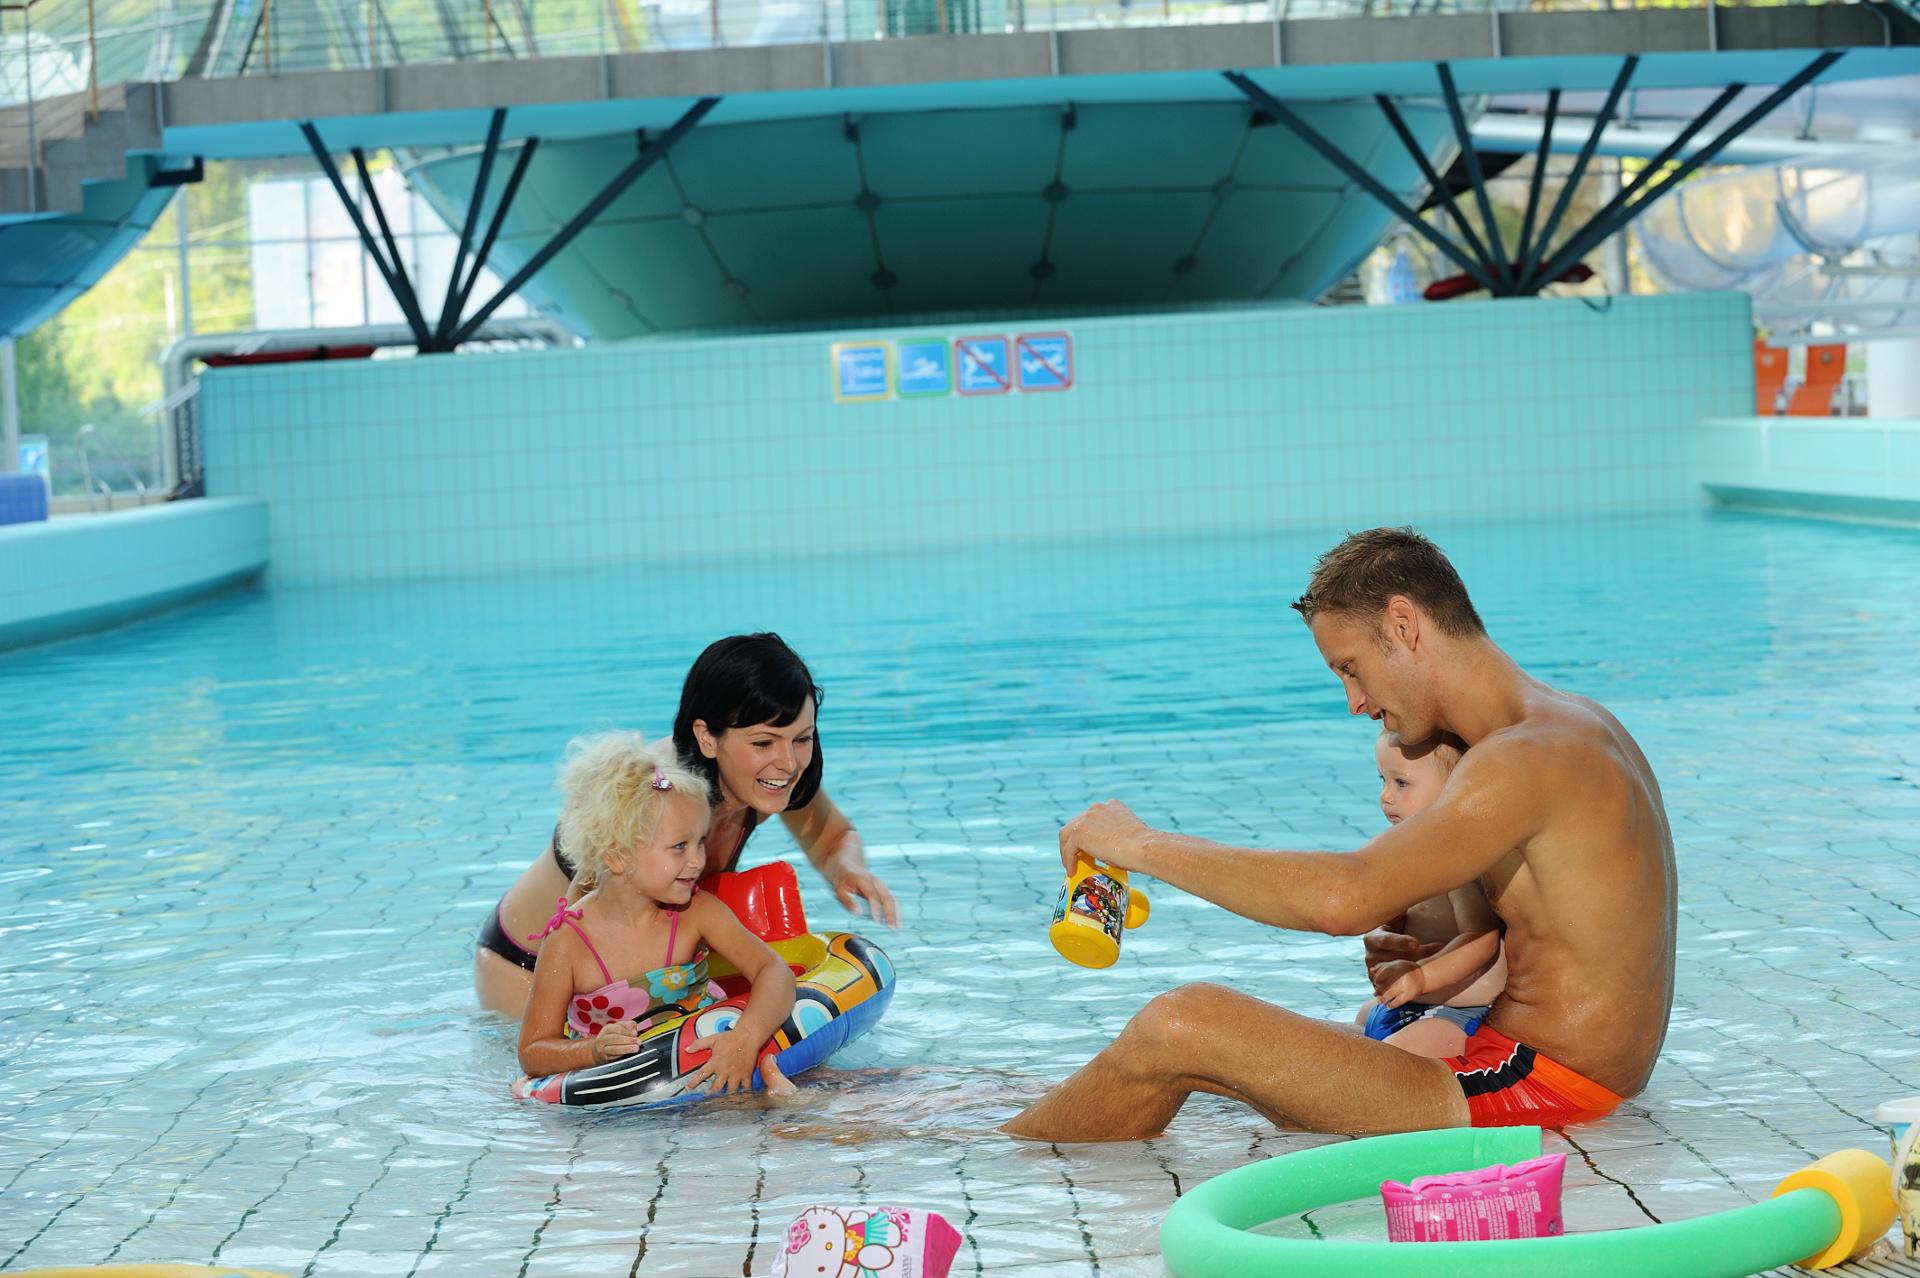 Fammily in aquapark